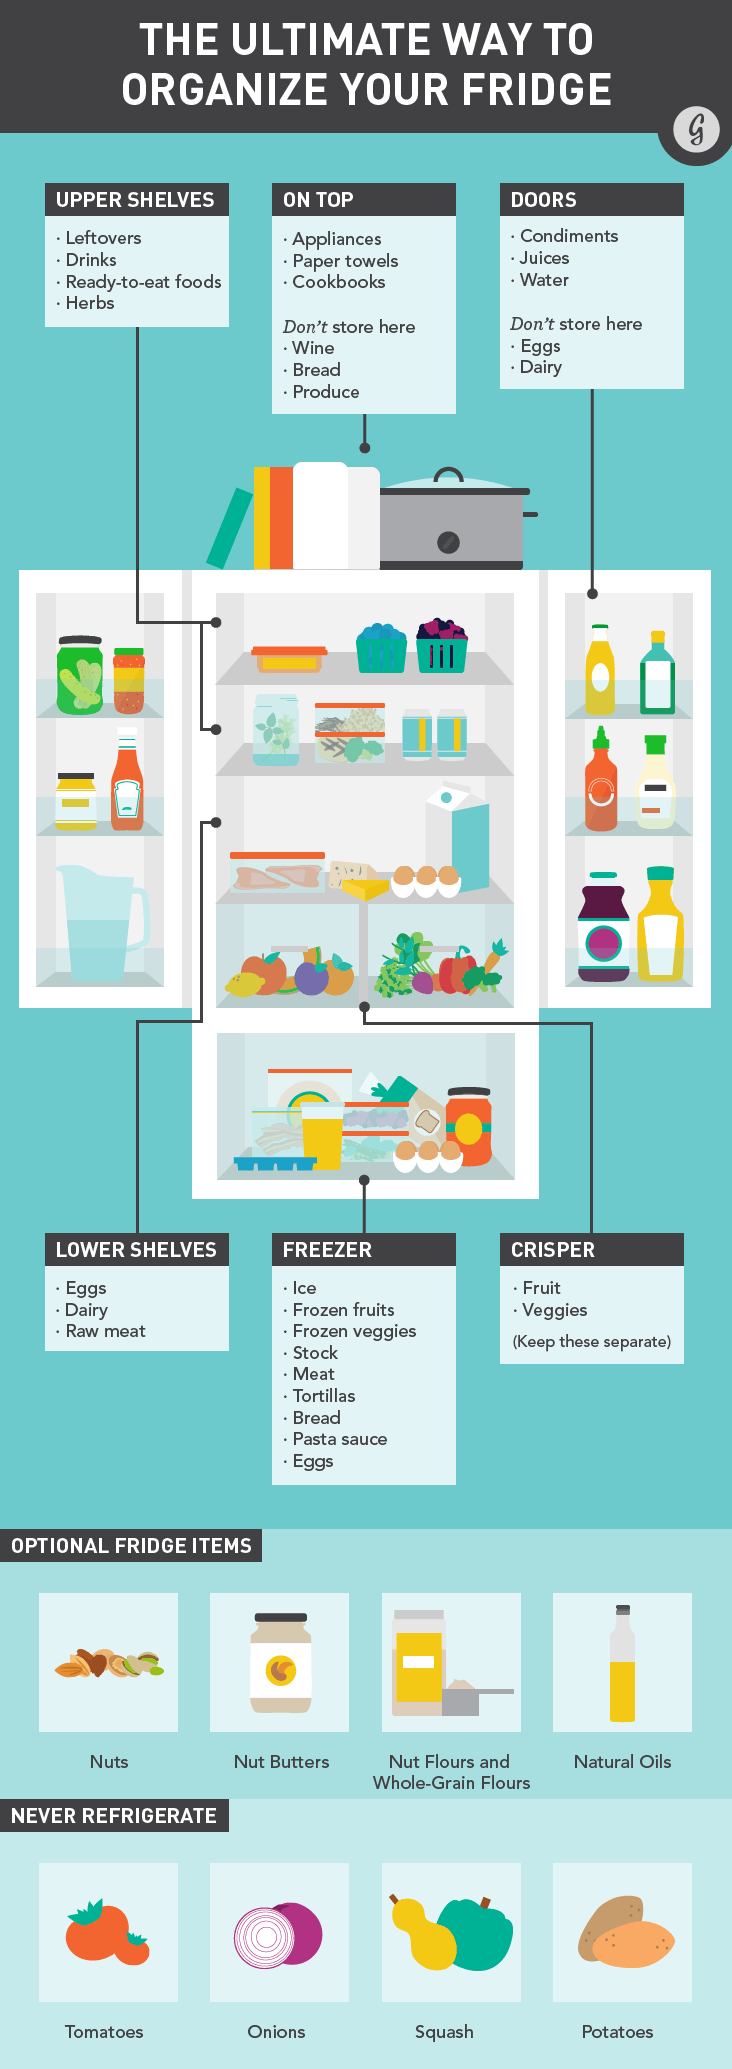 http://greatist.com/eat/ultimate-way-organize-your-fridge